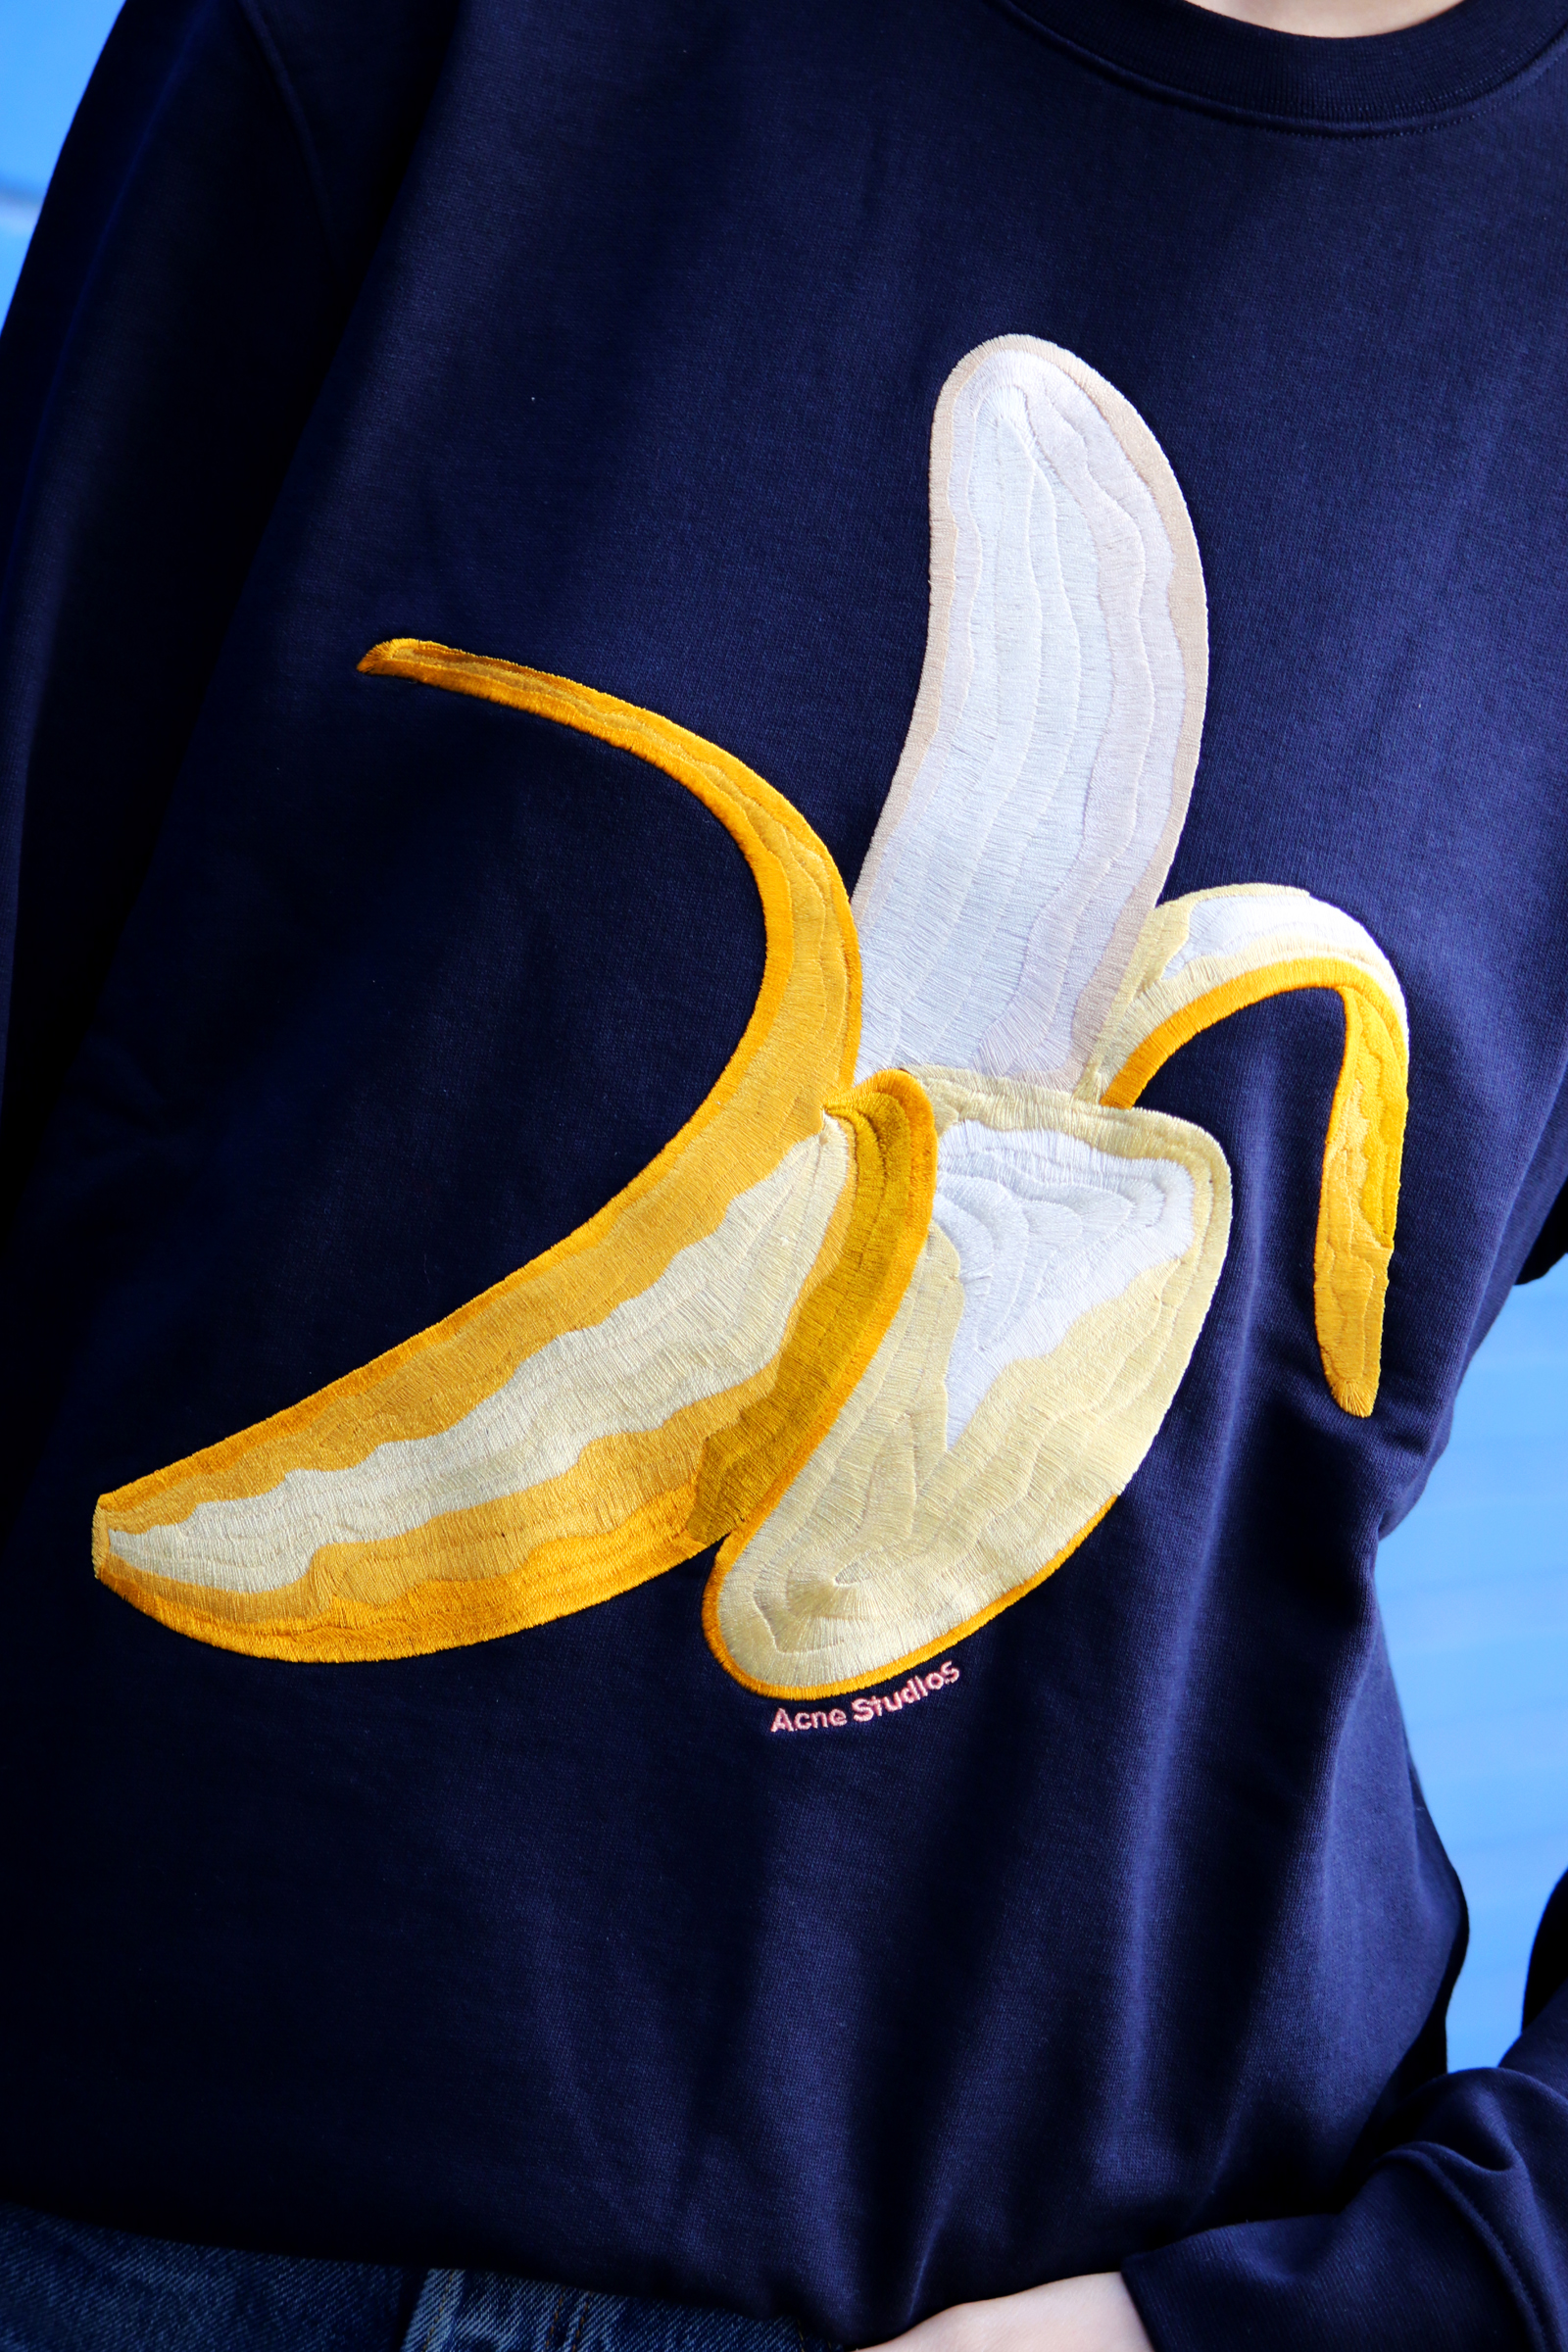 Acne Studios Banana Sweatshirt chloechill.com